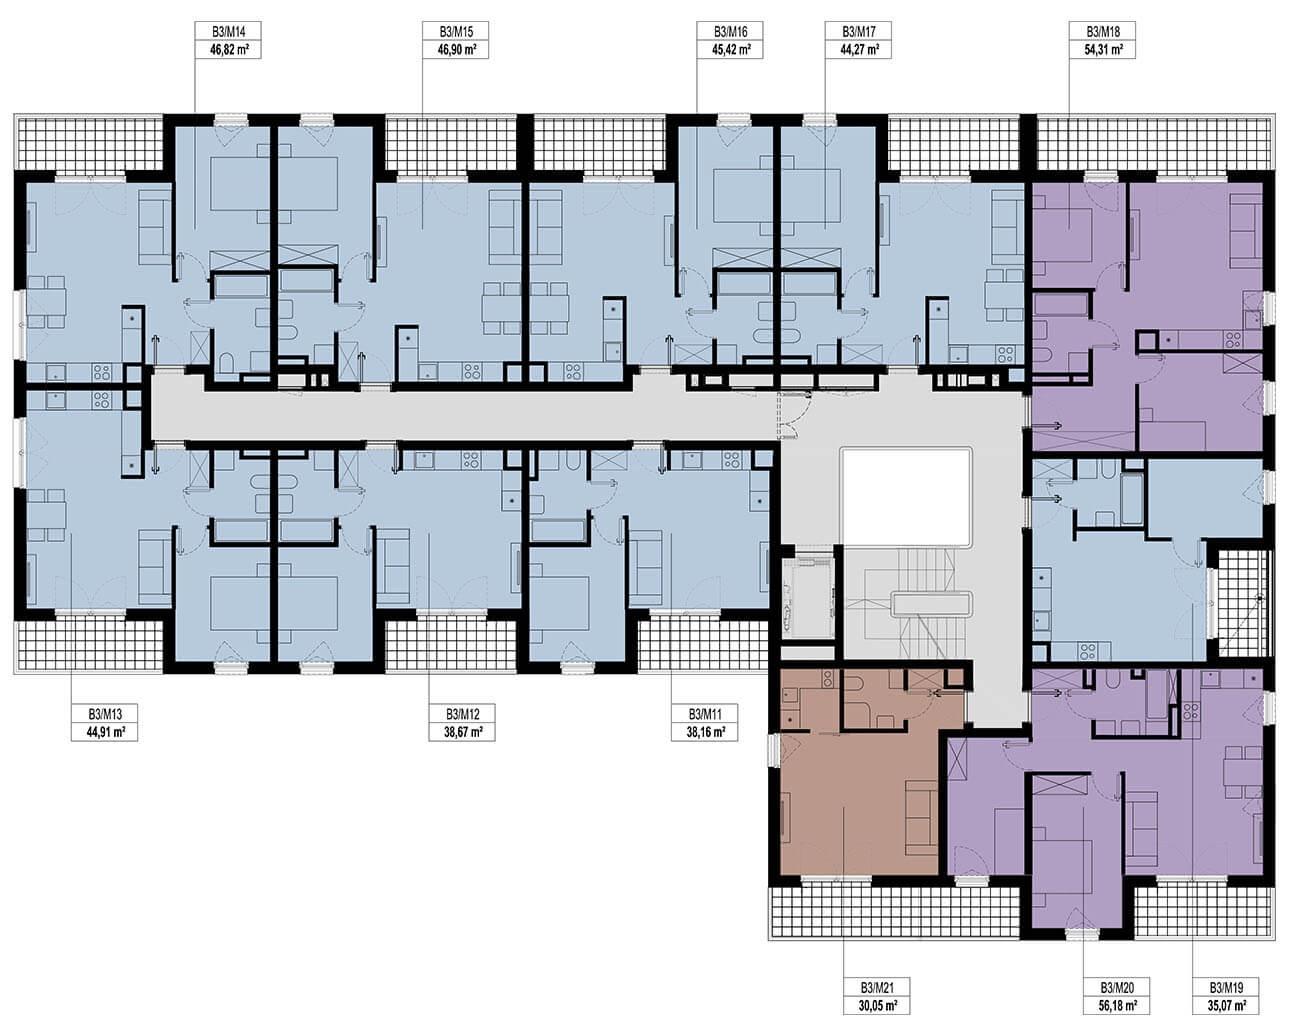 Etap 3 - Budynek B - Piętro 1